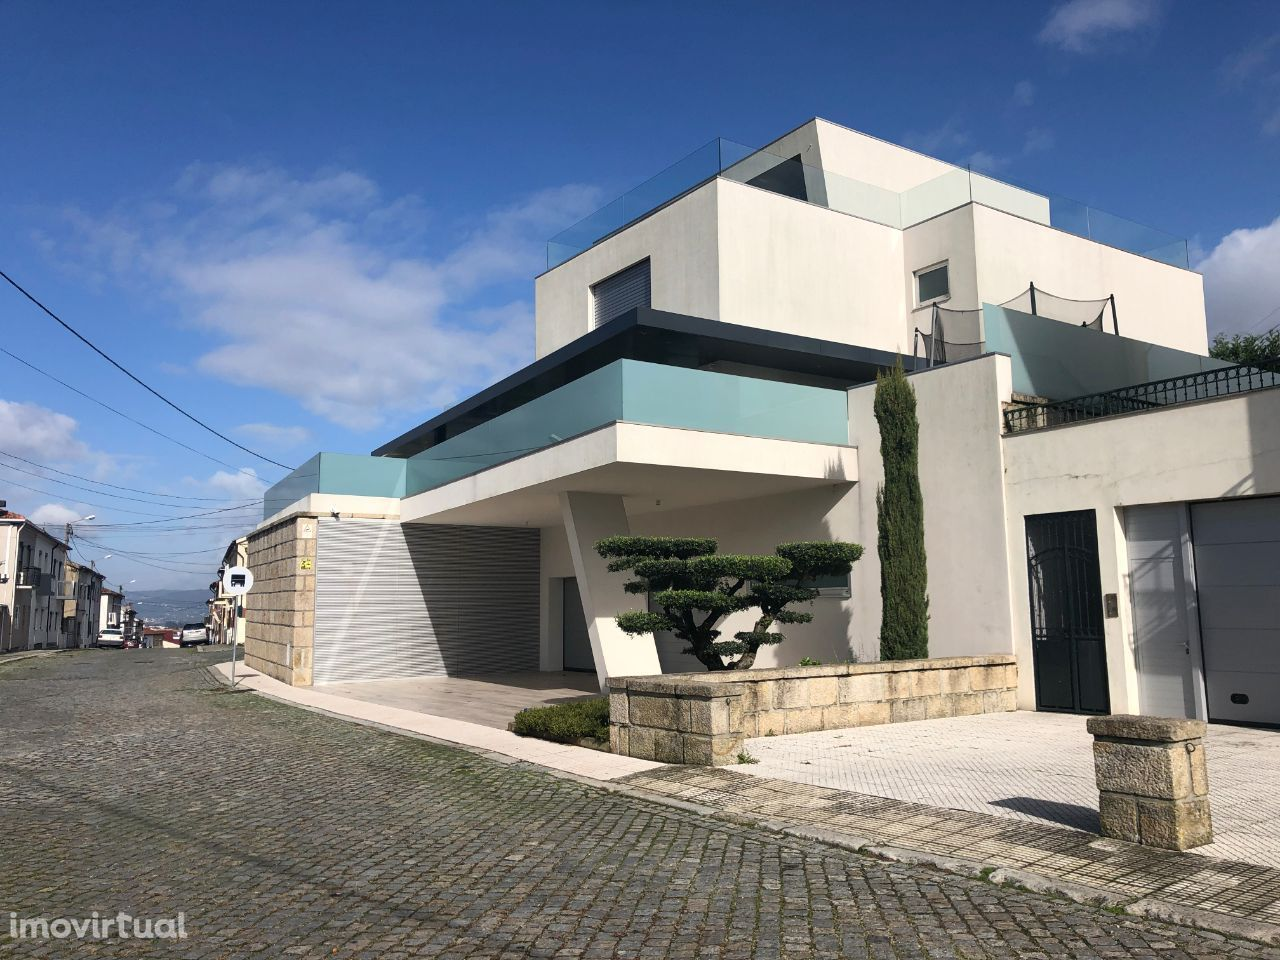 Moradia T5 de luxo com piscina interior - Real